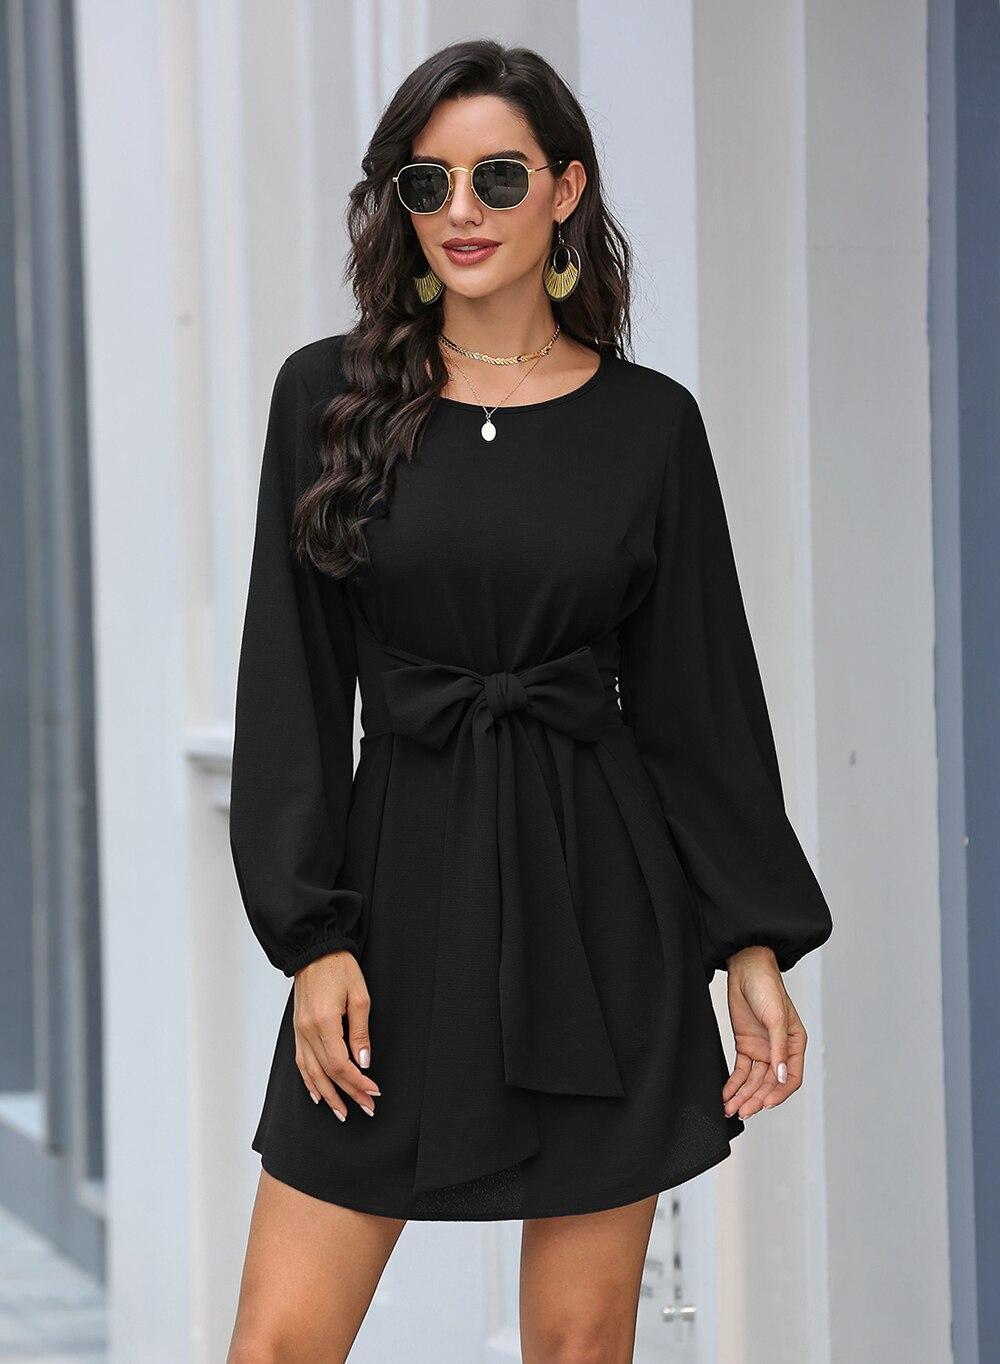 Black Lantern Sleeve Round Neck Casual Dress 20